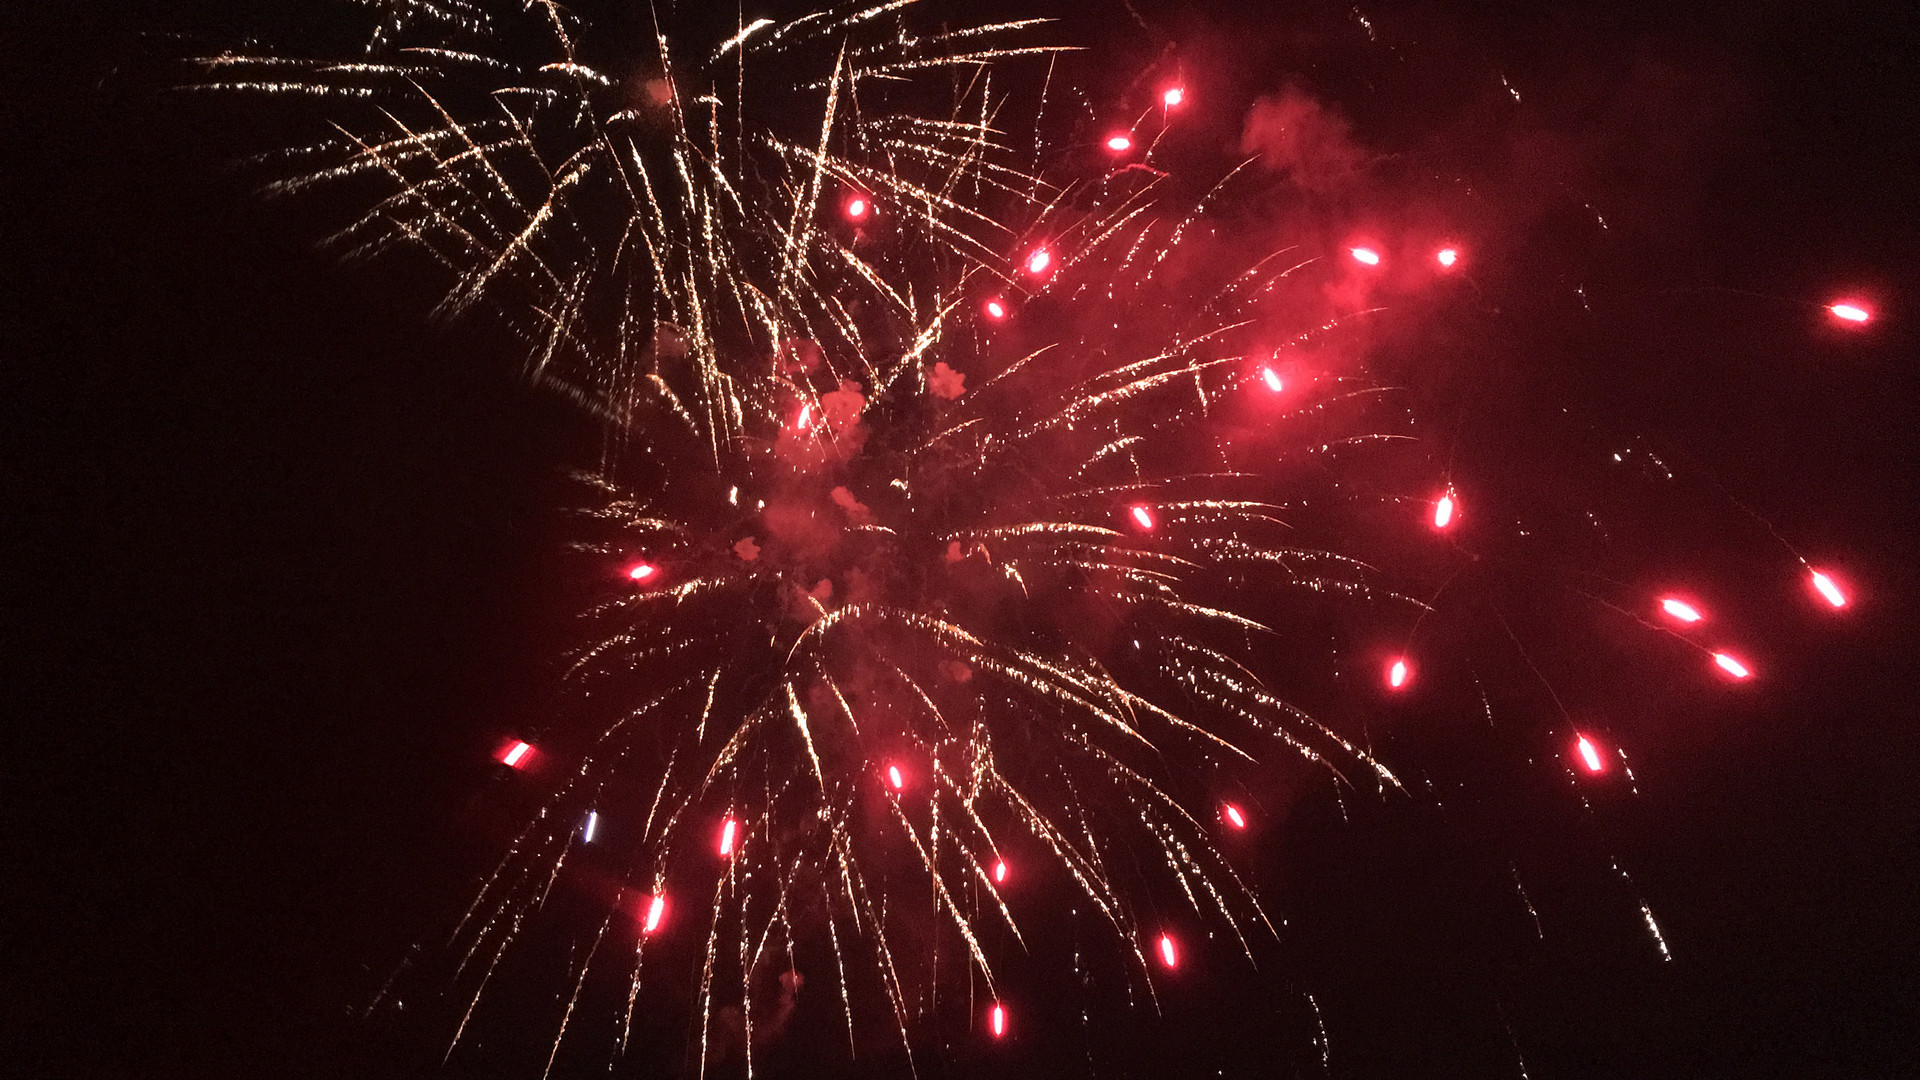 4th of July fireworks, red burst